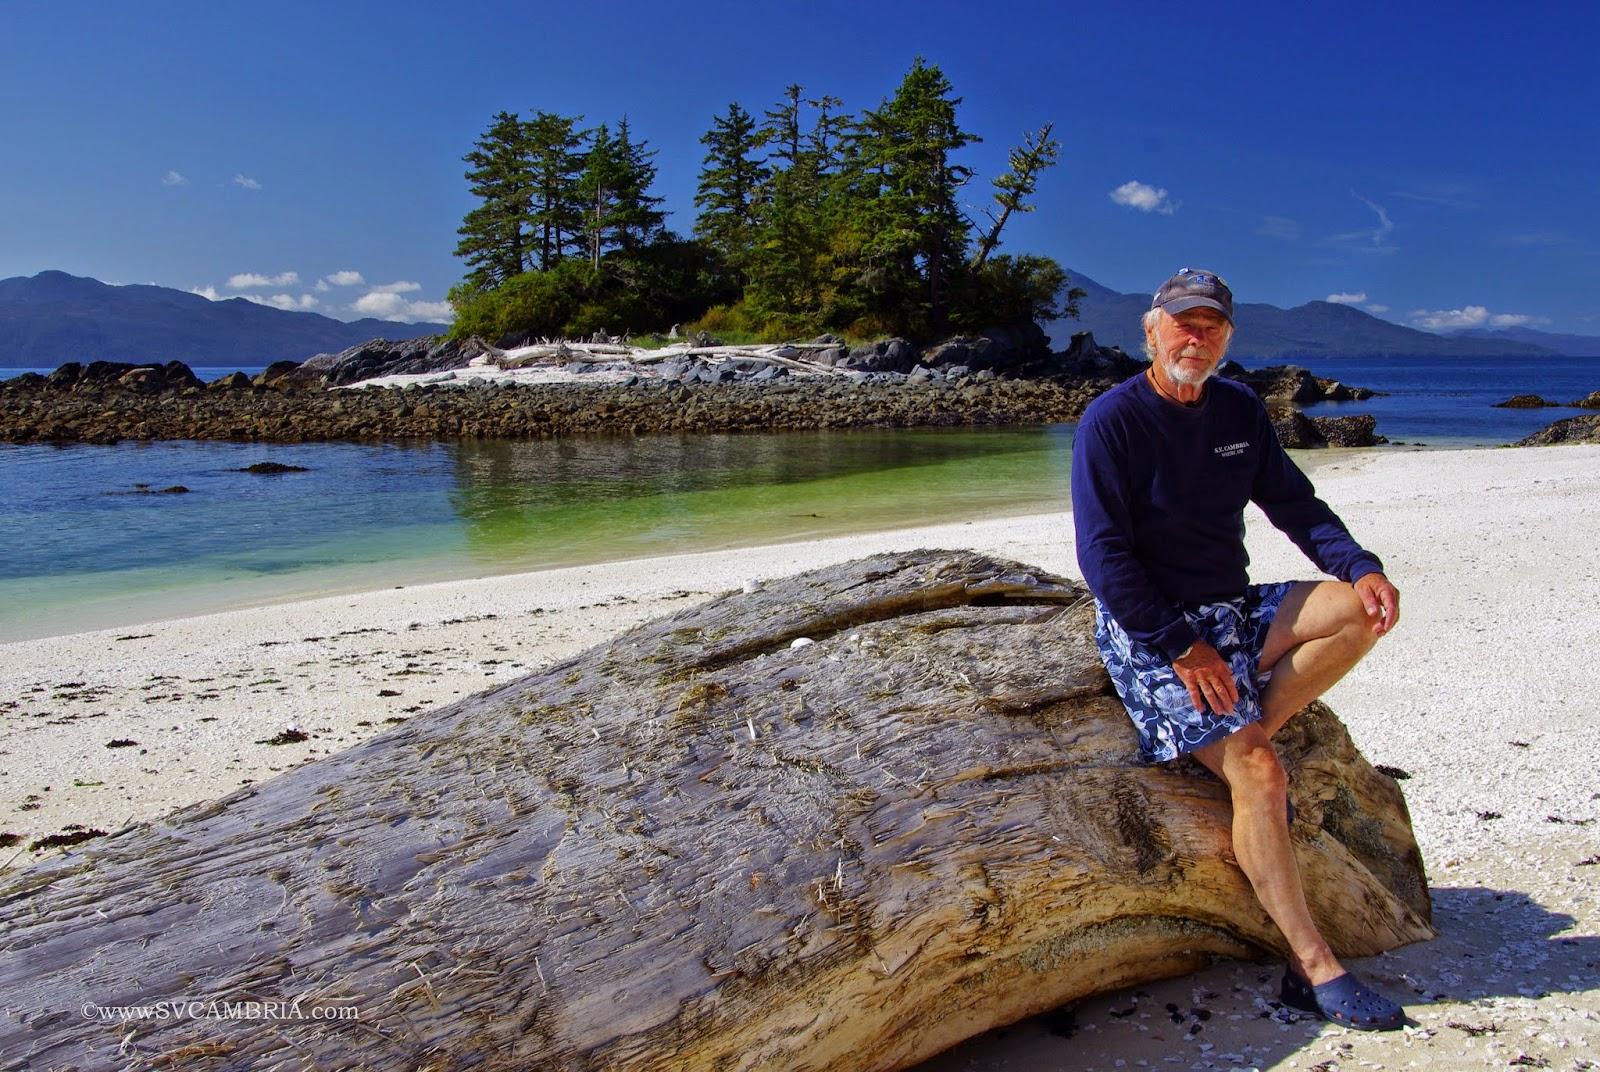 David on the beach at Fury Island.